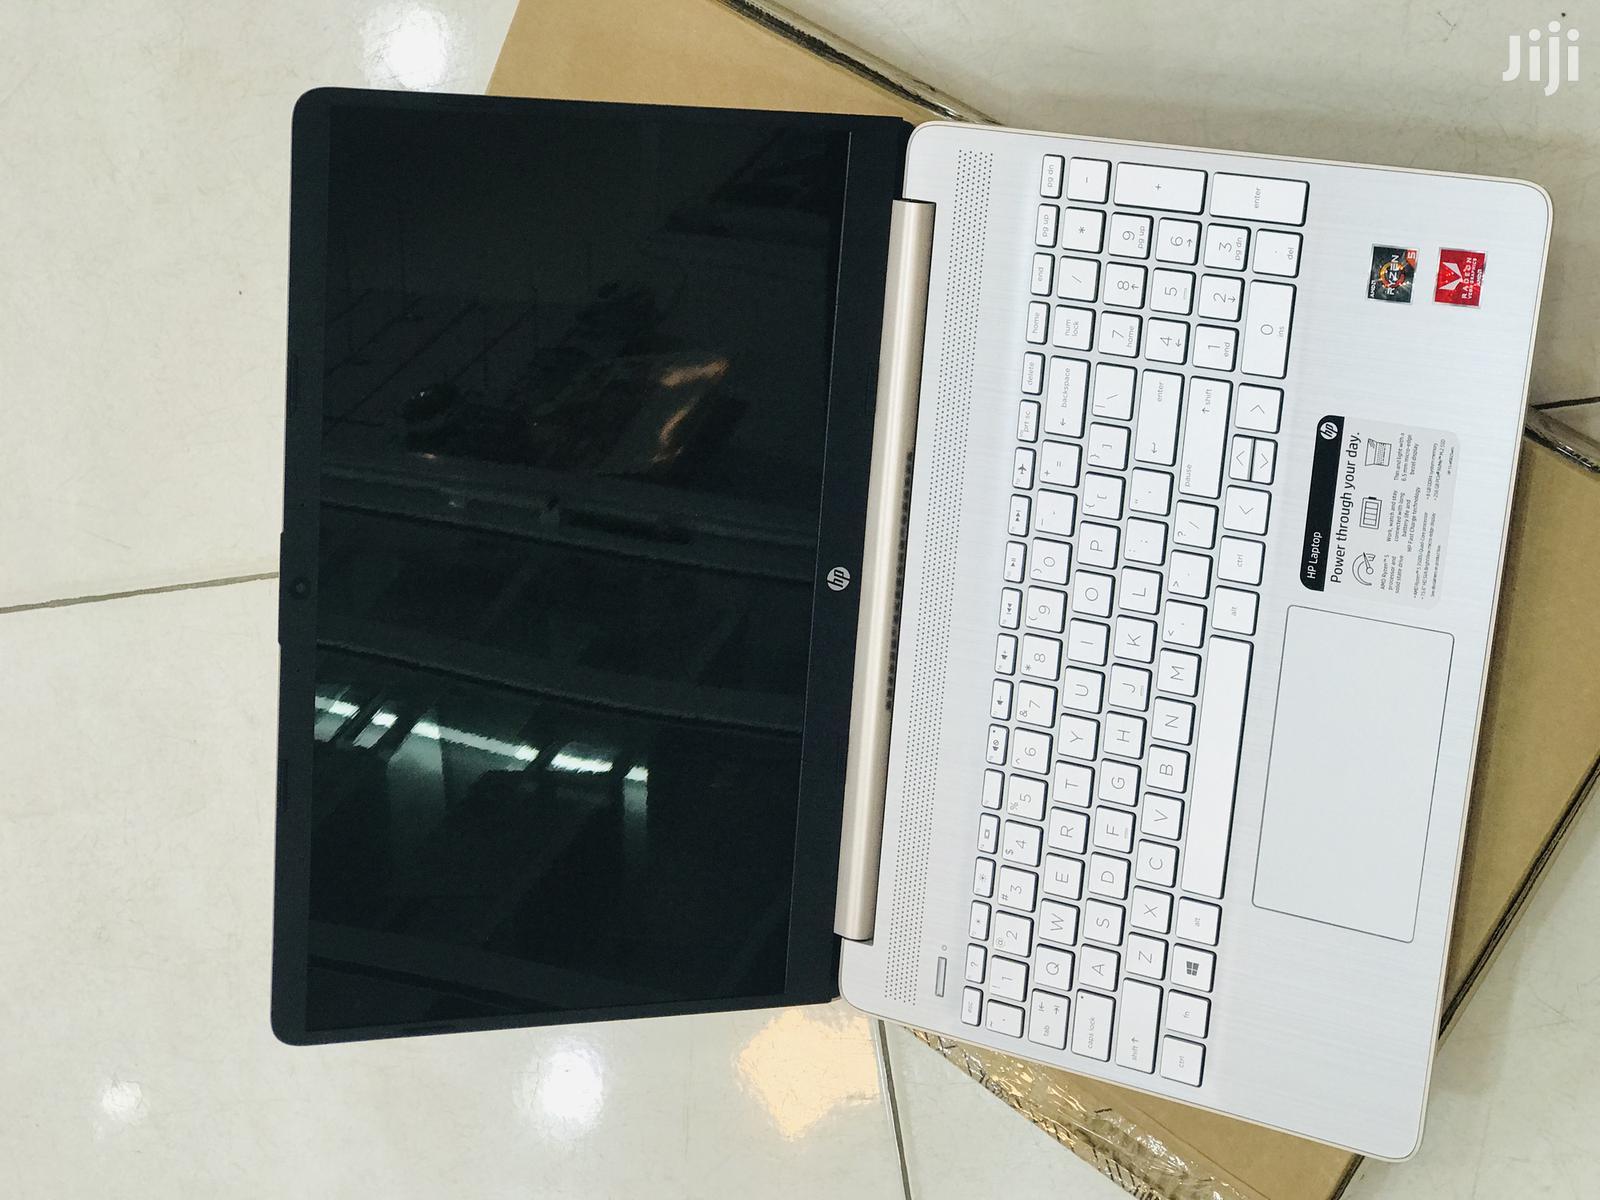 New Laptop HP 15-Ra003nia 8GB AMD Ryzen SSD 256GB | Laptops & Computers for sale in Accra Metropolitan, Greater Accra, Ghana